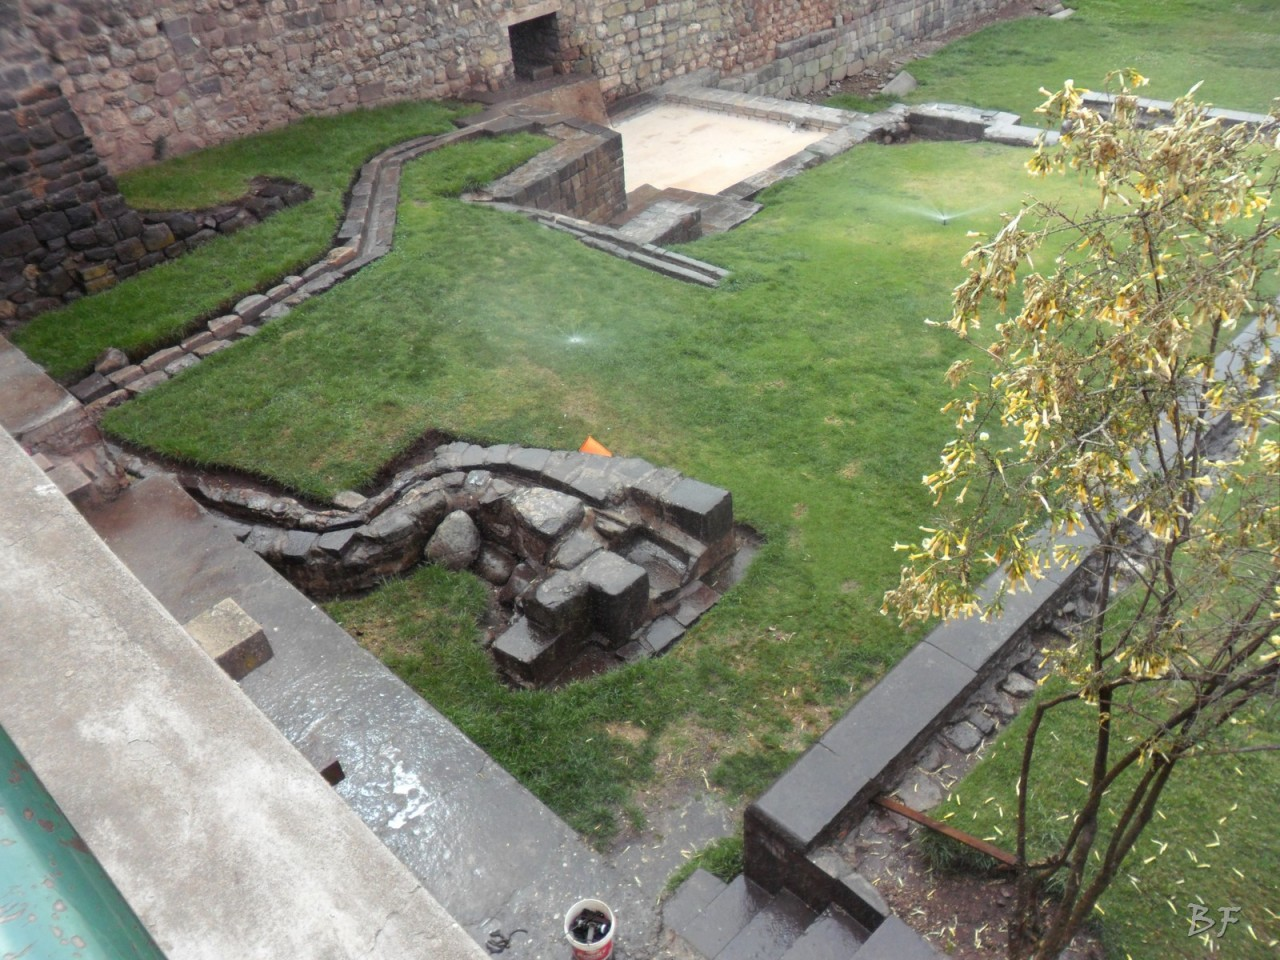 Mura-Poligonali-Megaliti-Tempio-Coricancha-Cusco-Perù-66